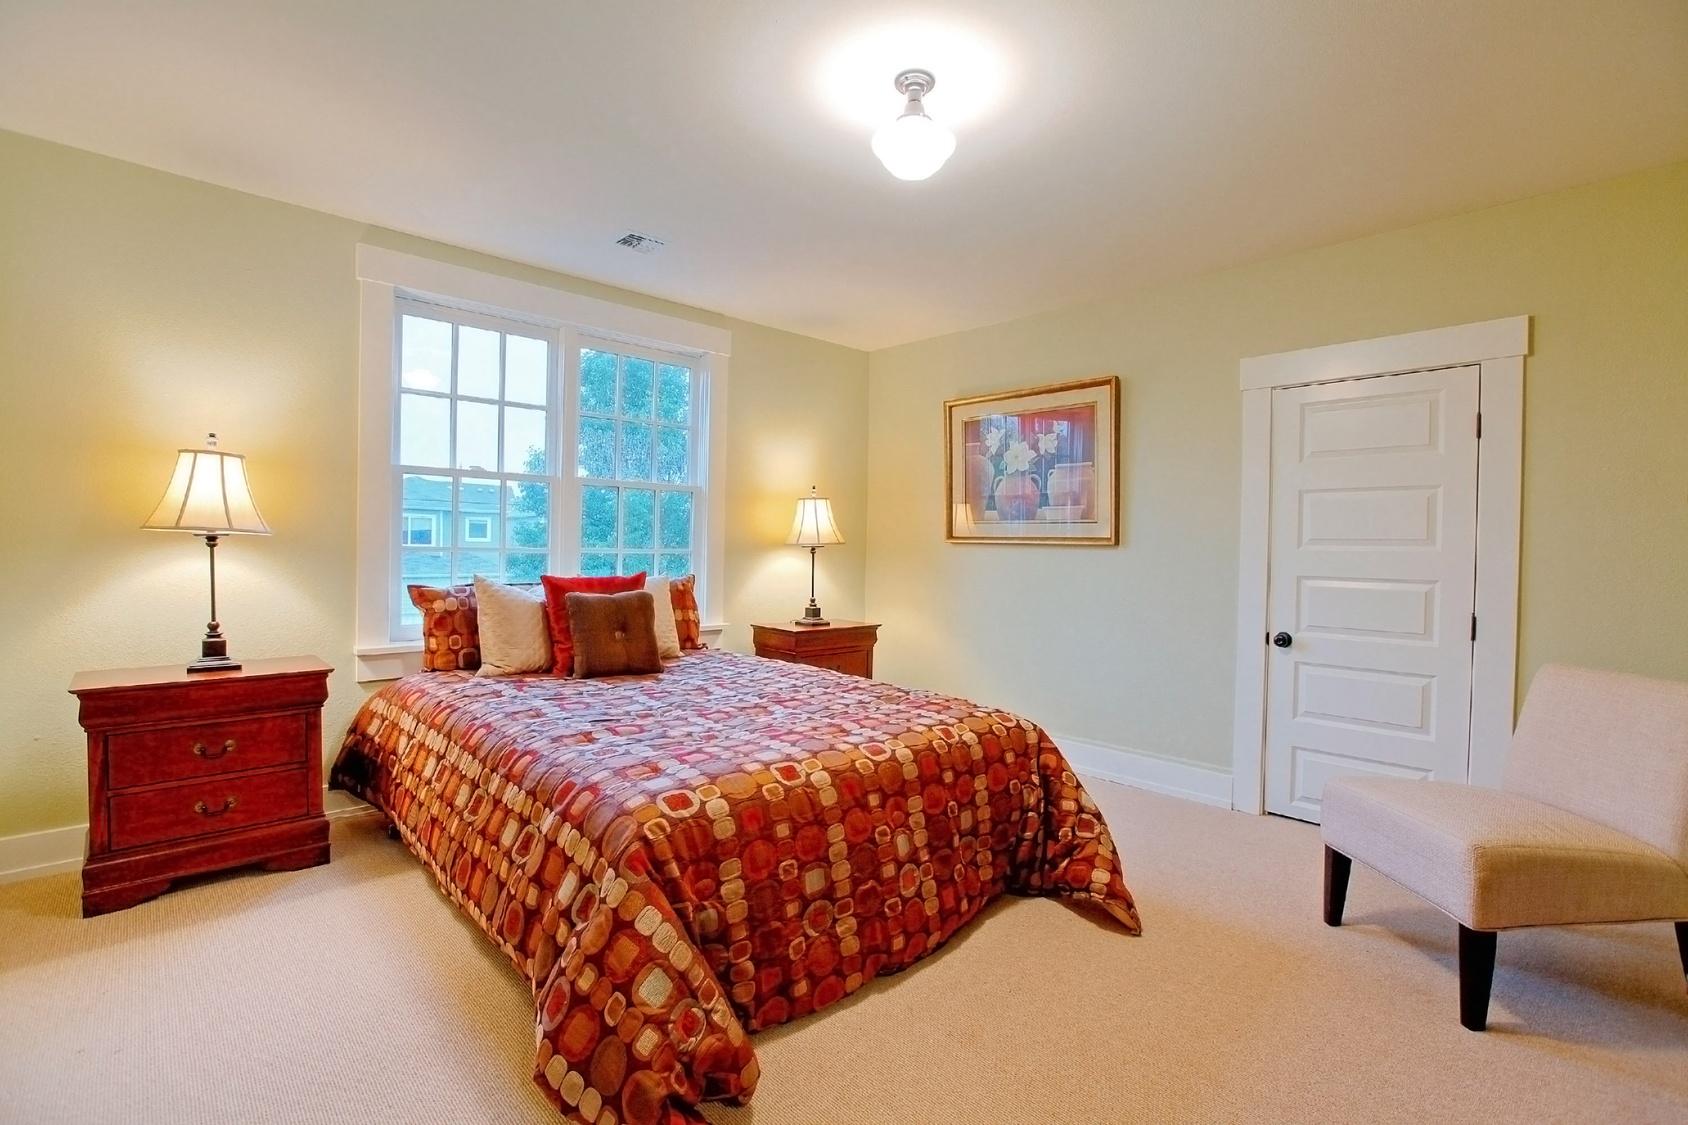 Bedroom Staging the 5 best secret to staging bedrooms